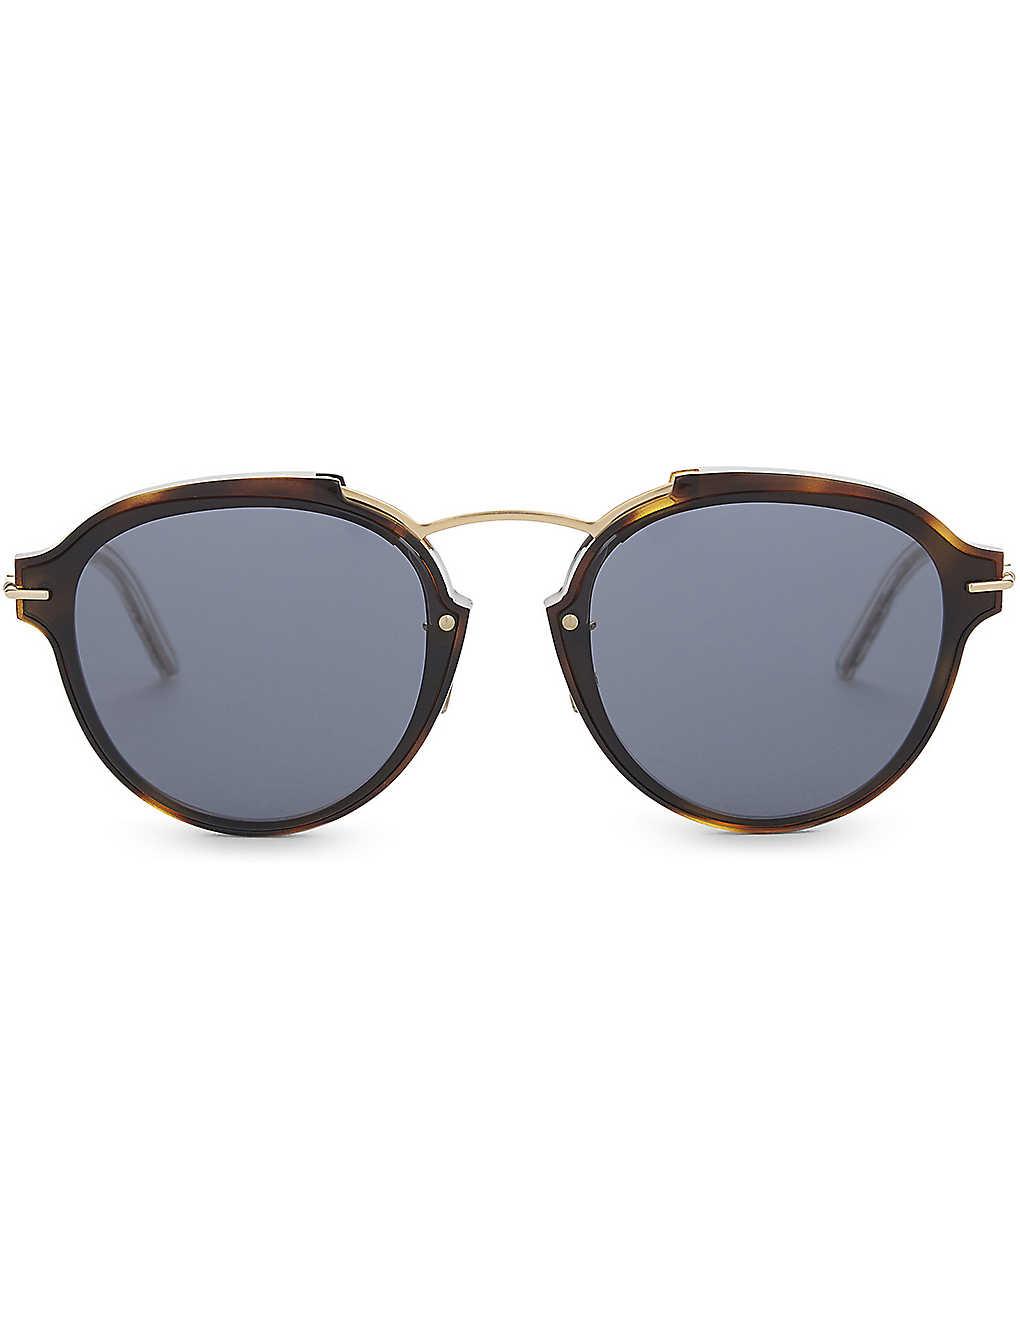 8eea953ecef DIOR - Eclat oval sunglasses